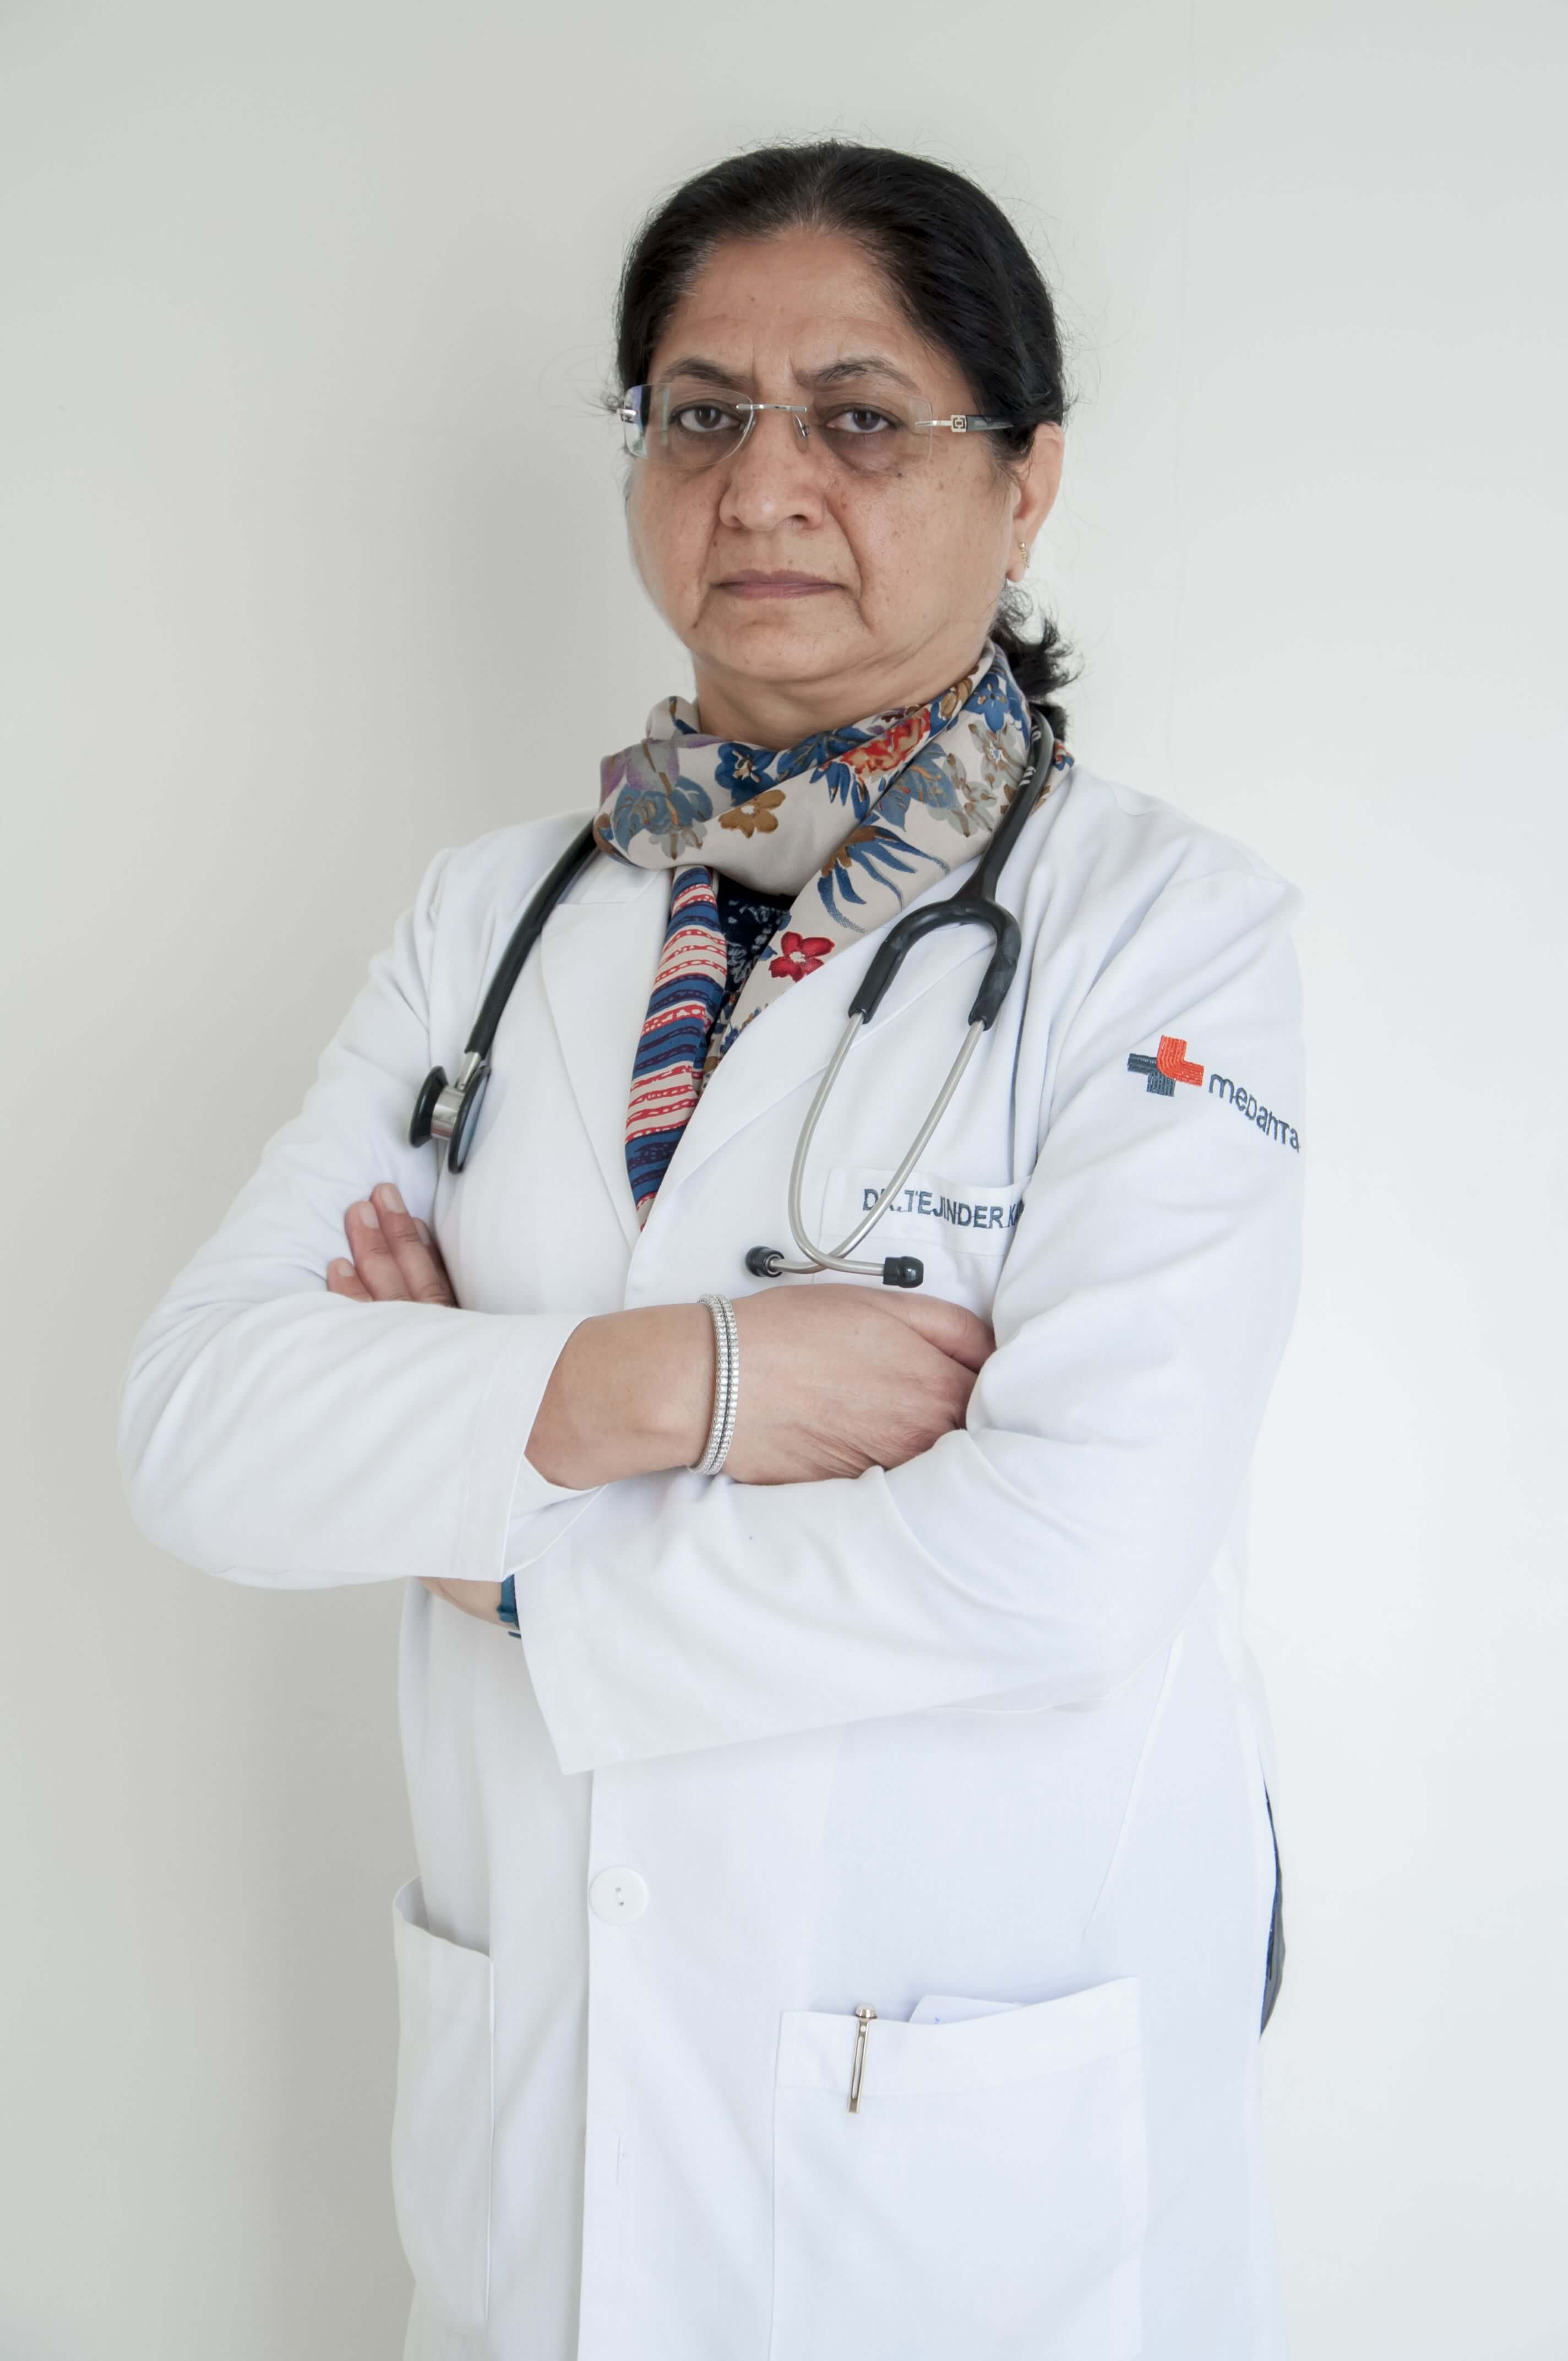 Dr. Tejinder Kataria